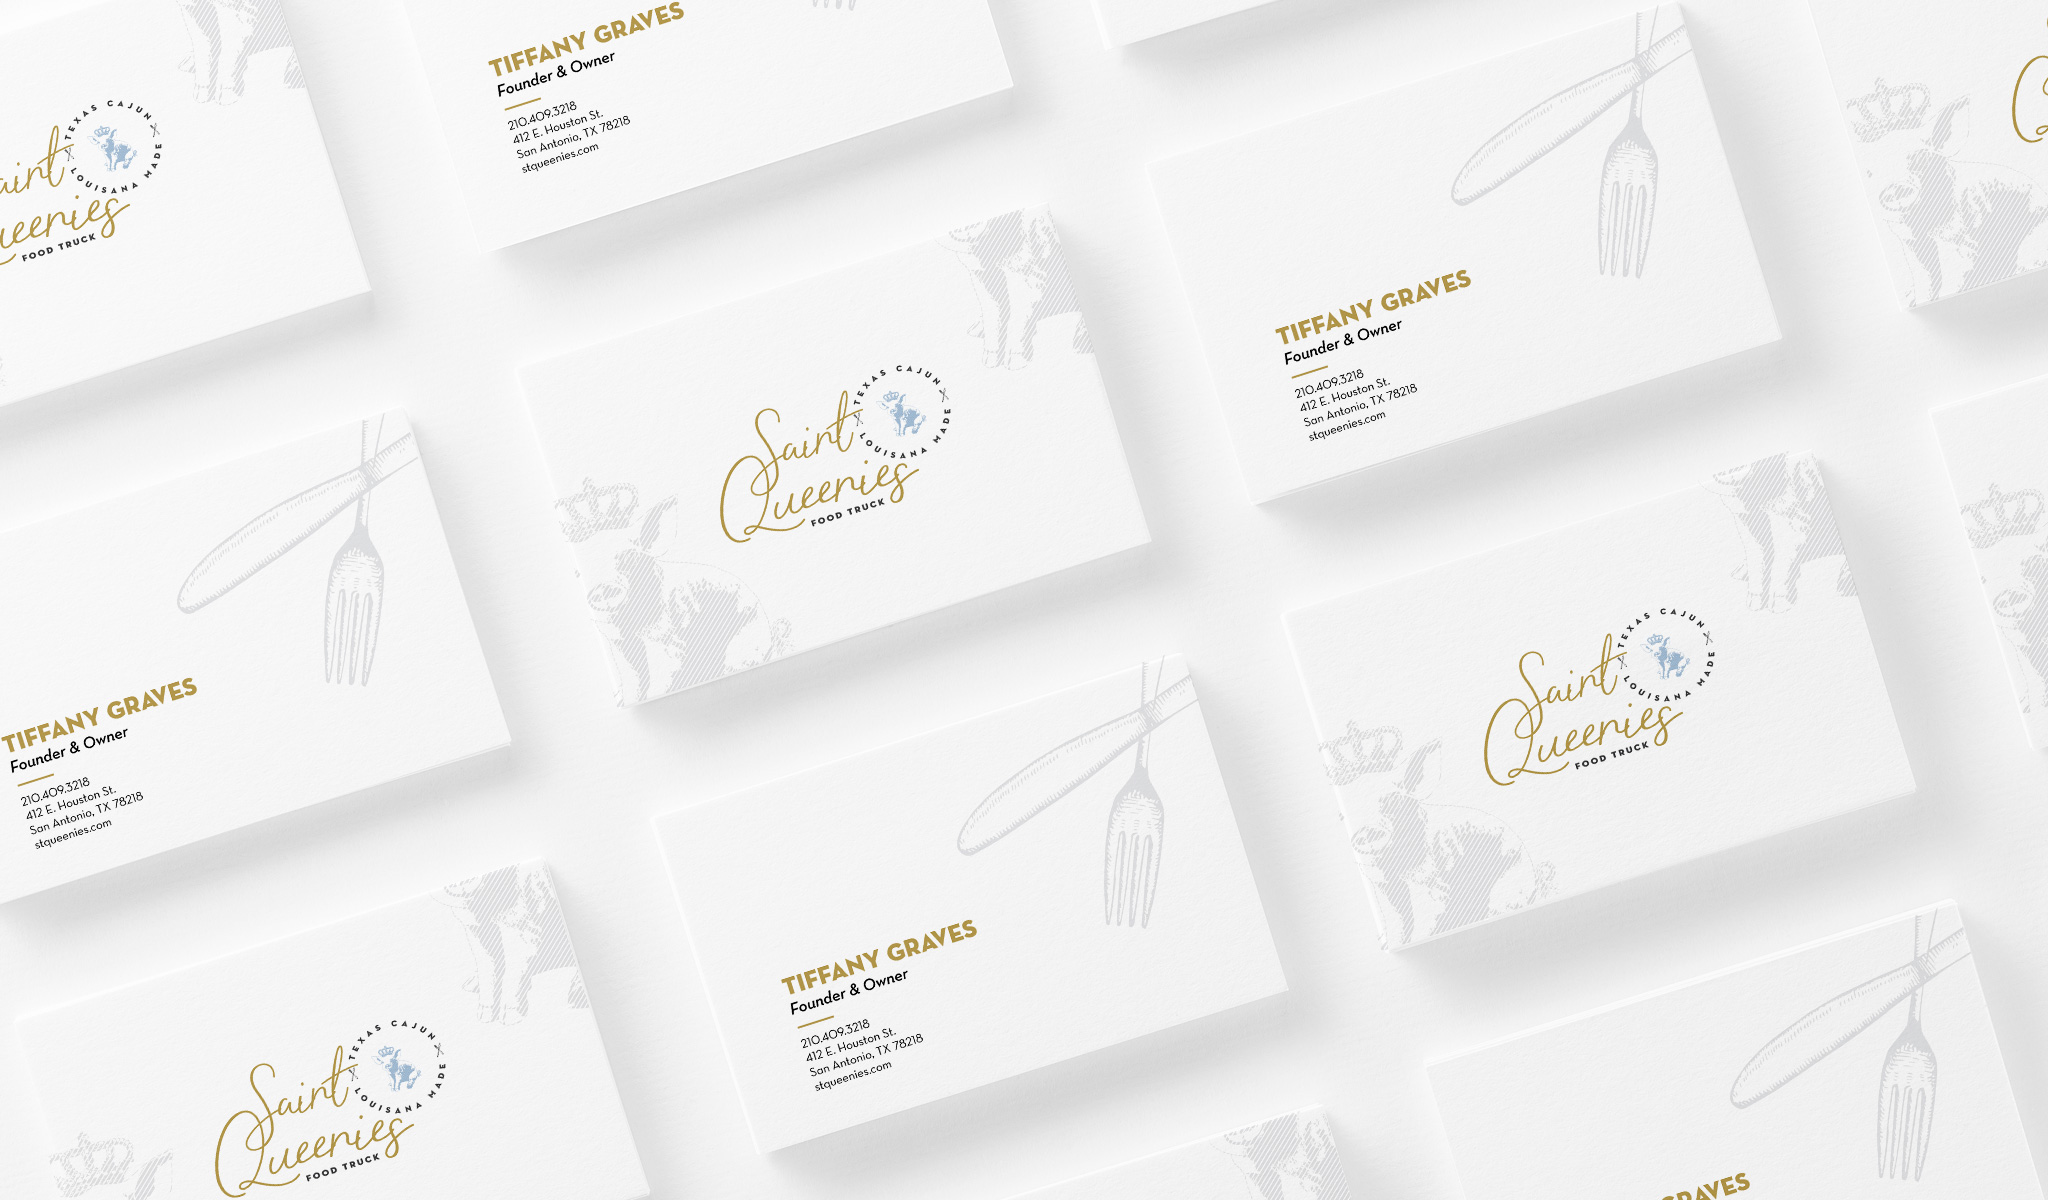 business-card-st-queenies